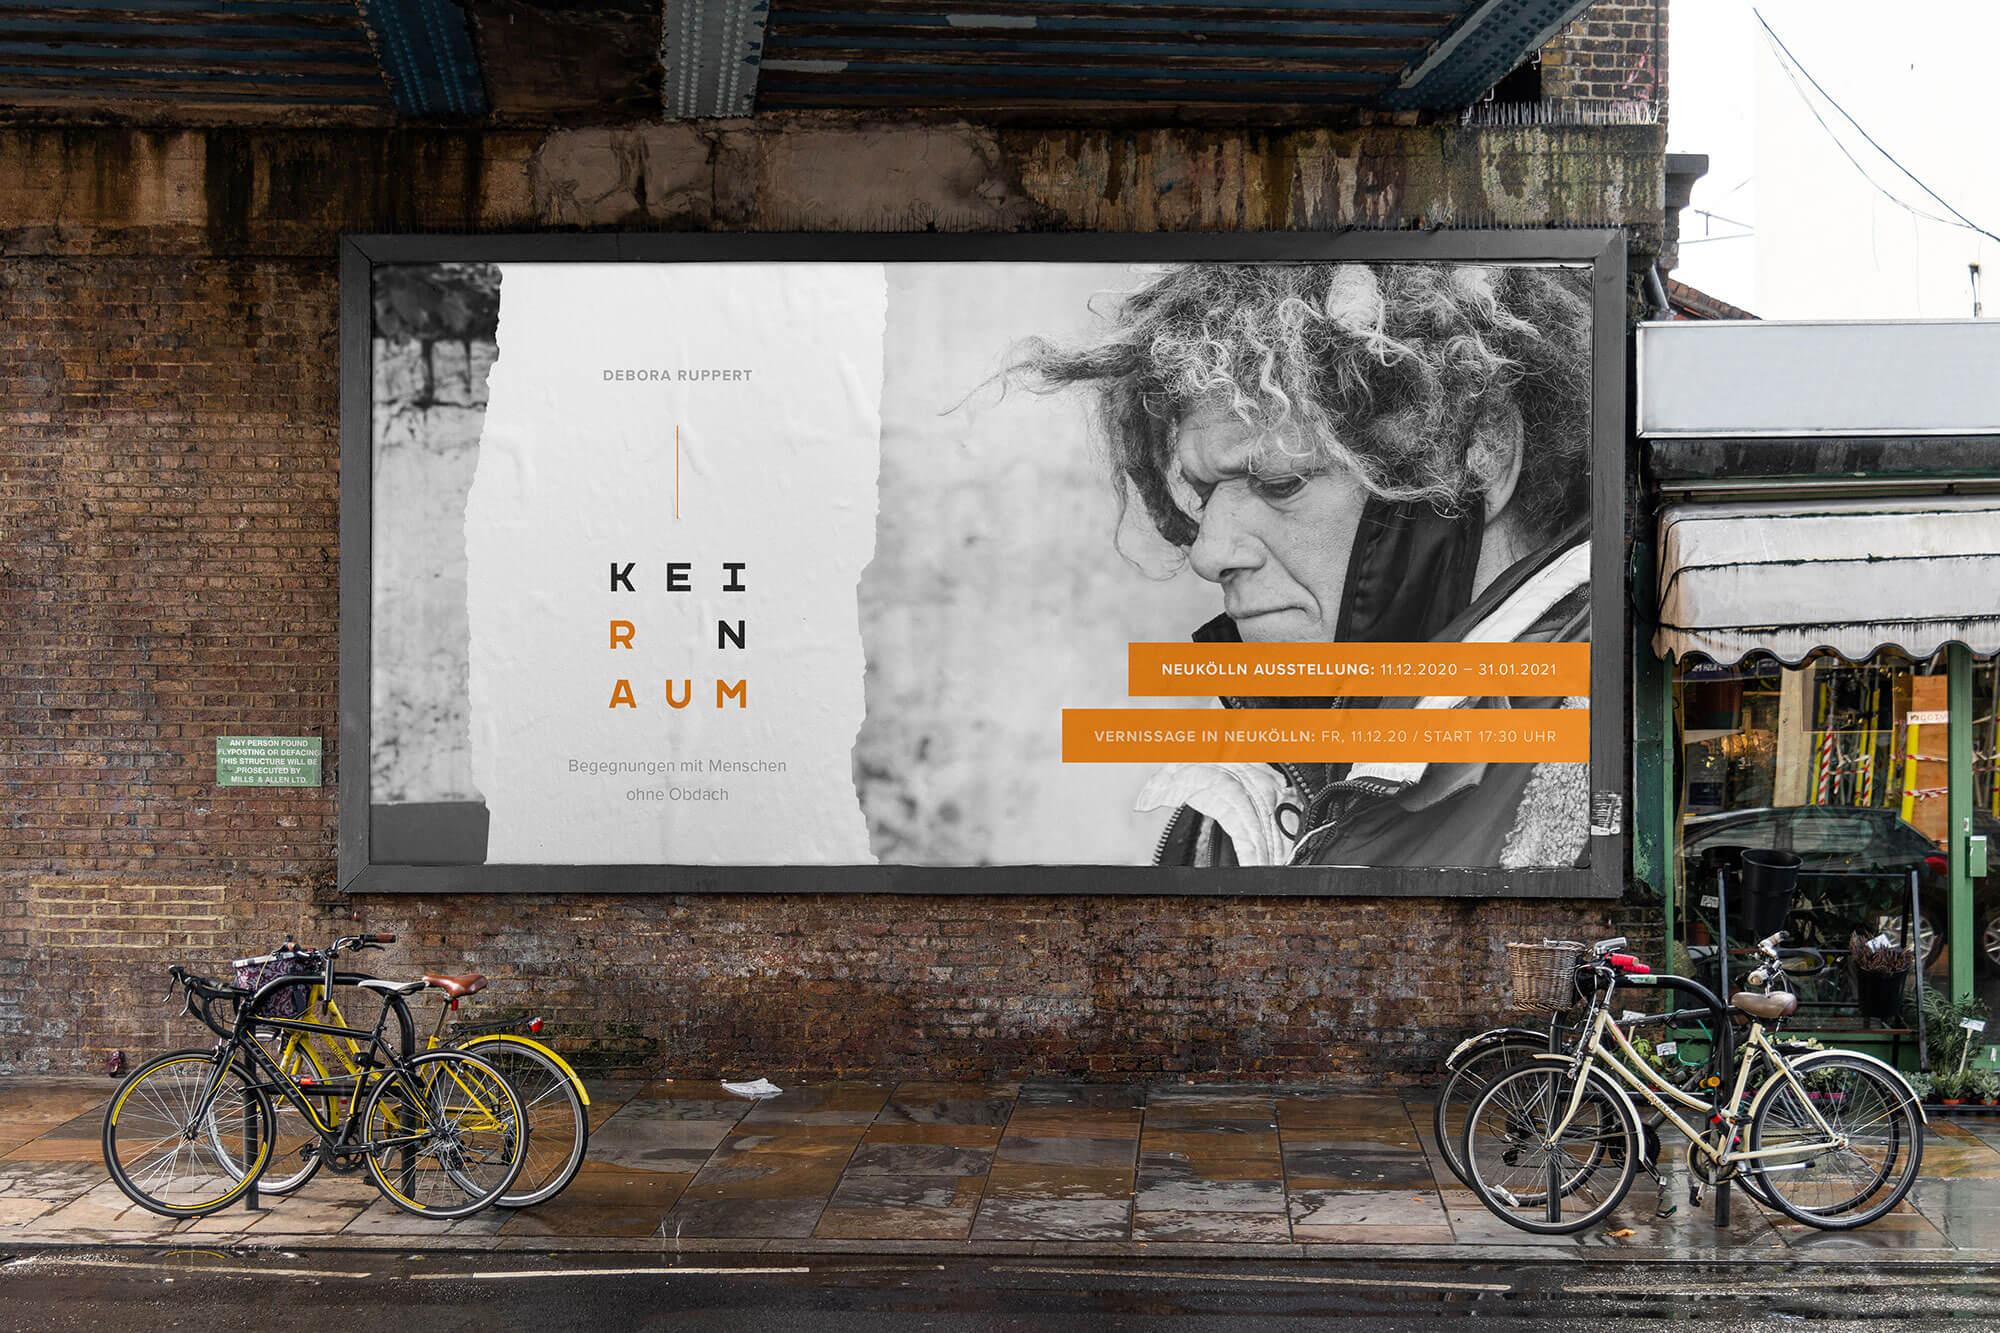 keinraum-billboard-mockup